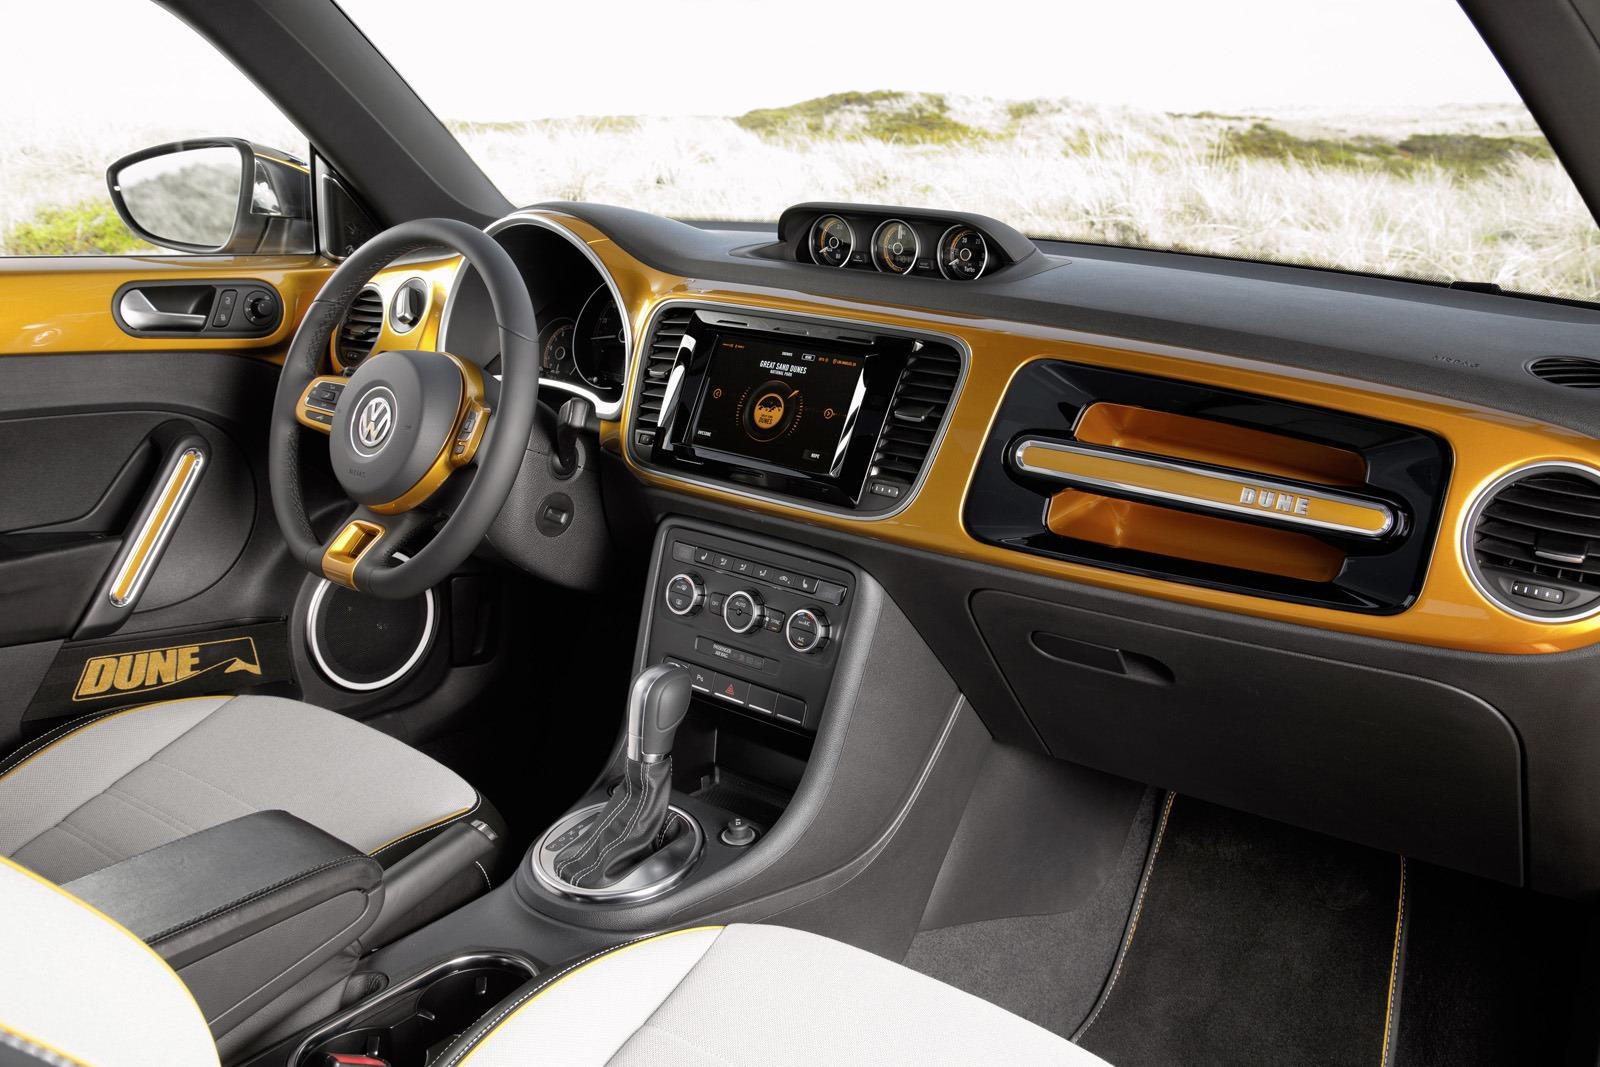 Фото | Салон VW Beetle Dune 2014 года